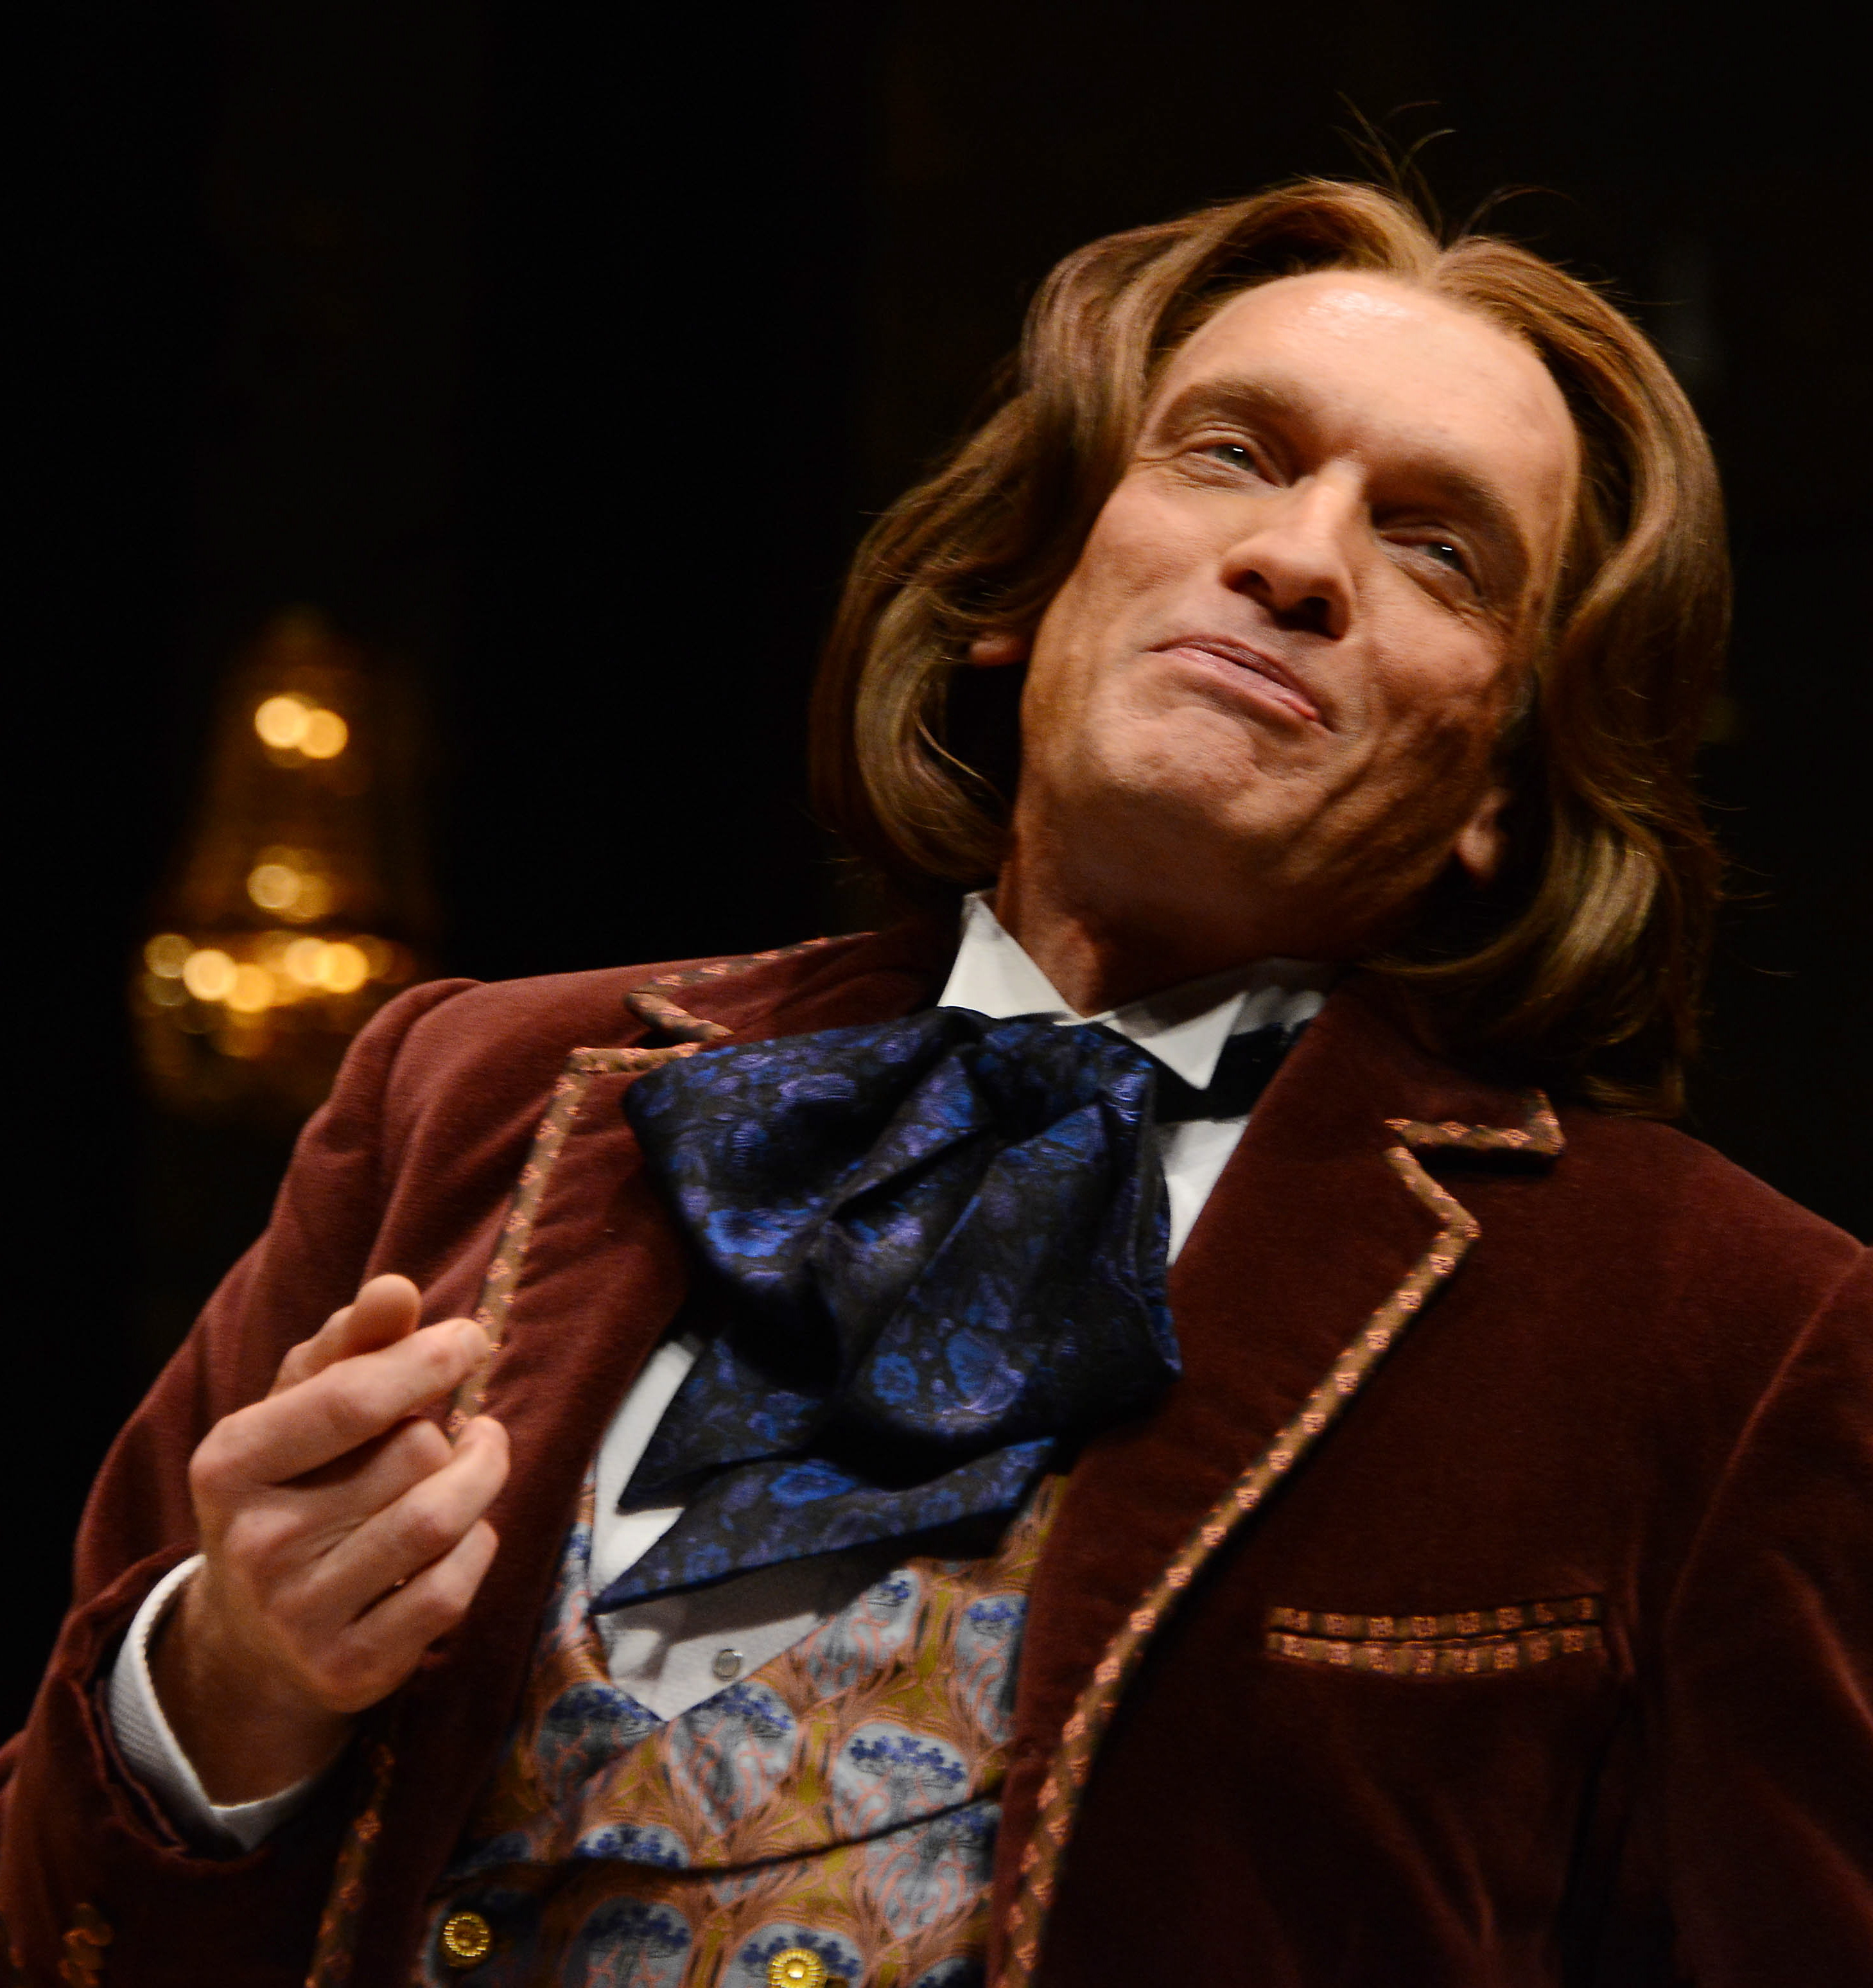 Brent Harris looks, walks, and talks like Oscar Wilde. But he doesn't quack.